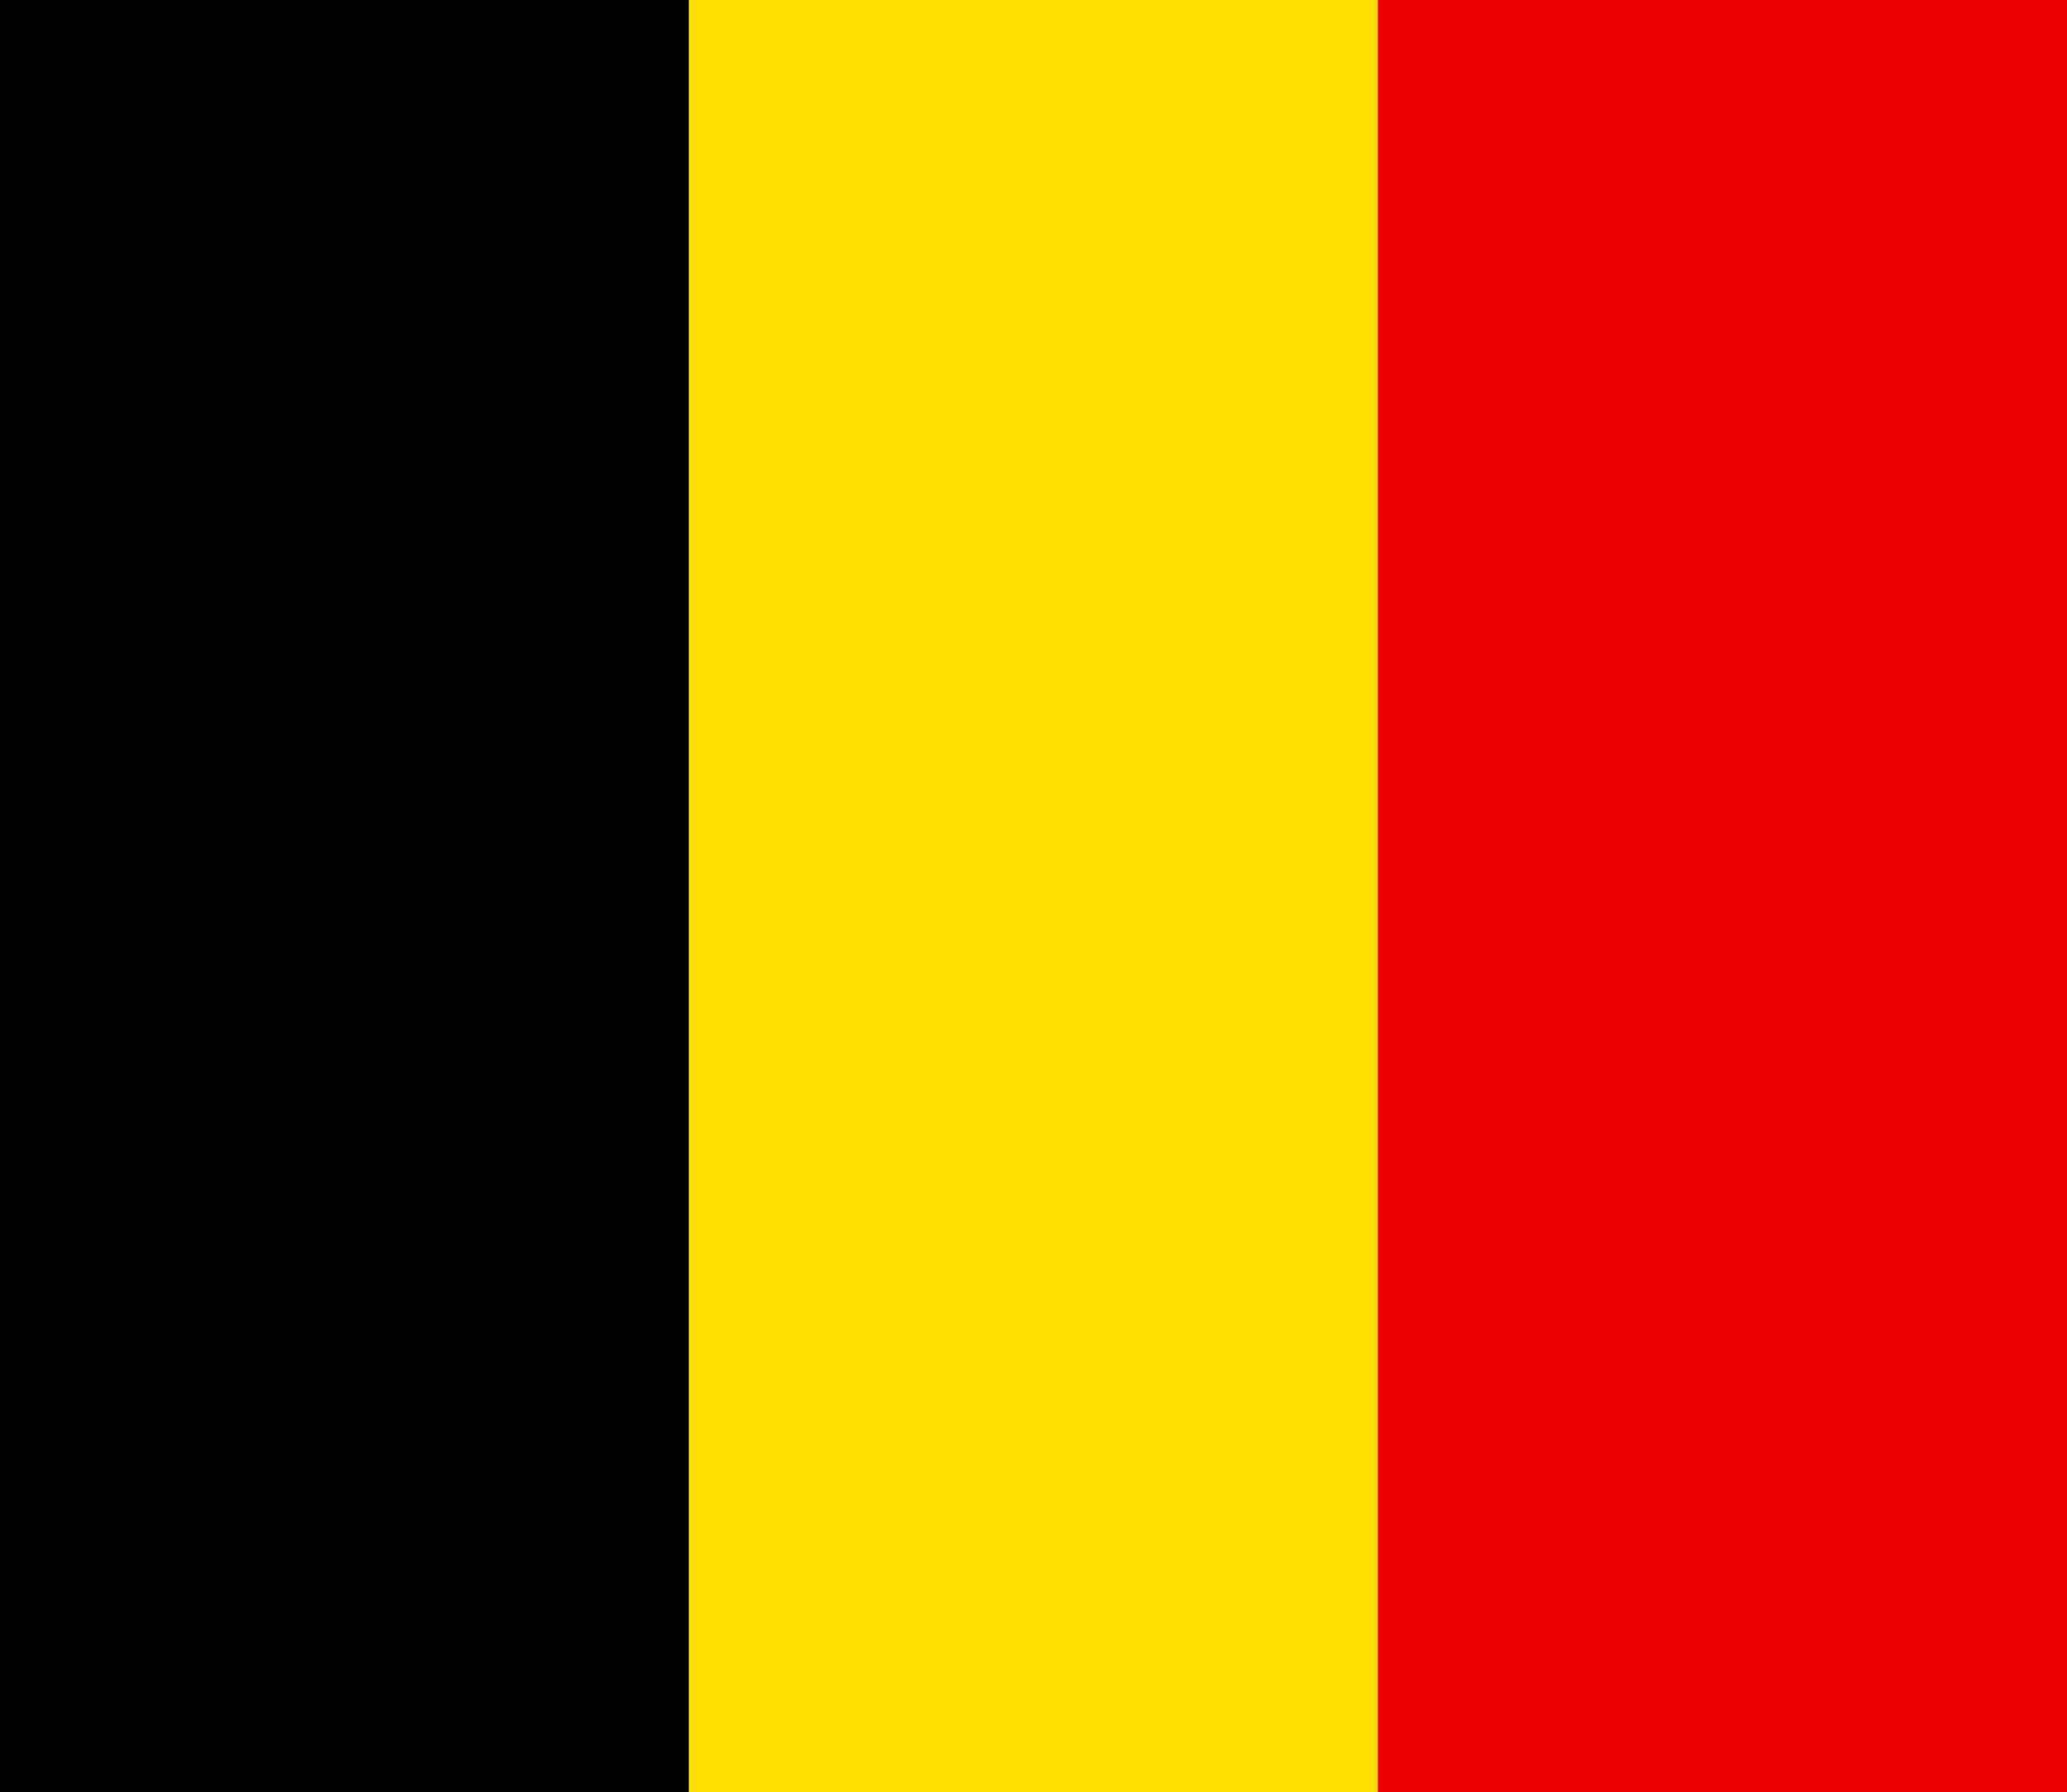 Belgio, paese, emblema, logo, simbolo - Sfondi HD - Professor-falken.com